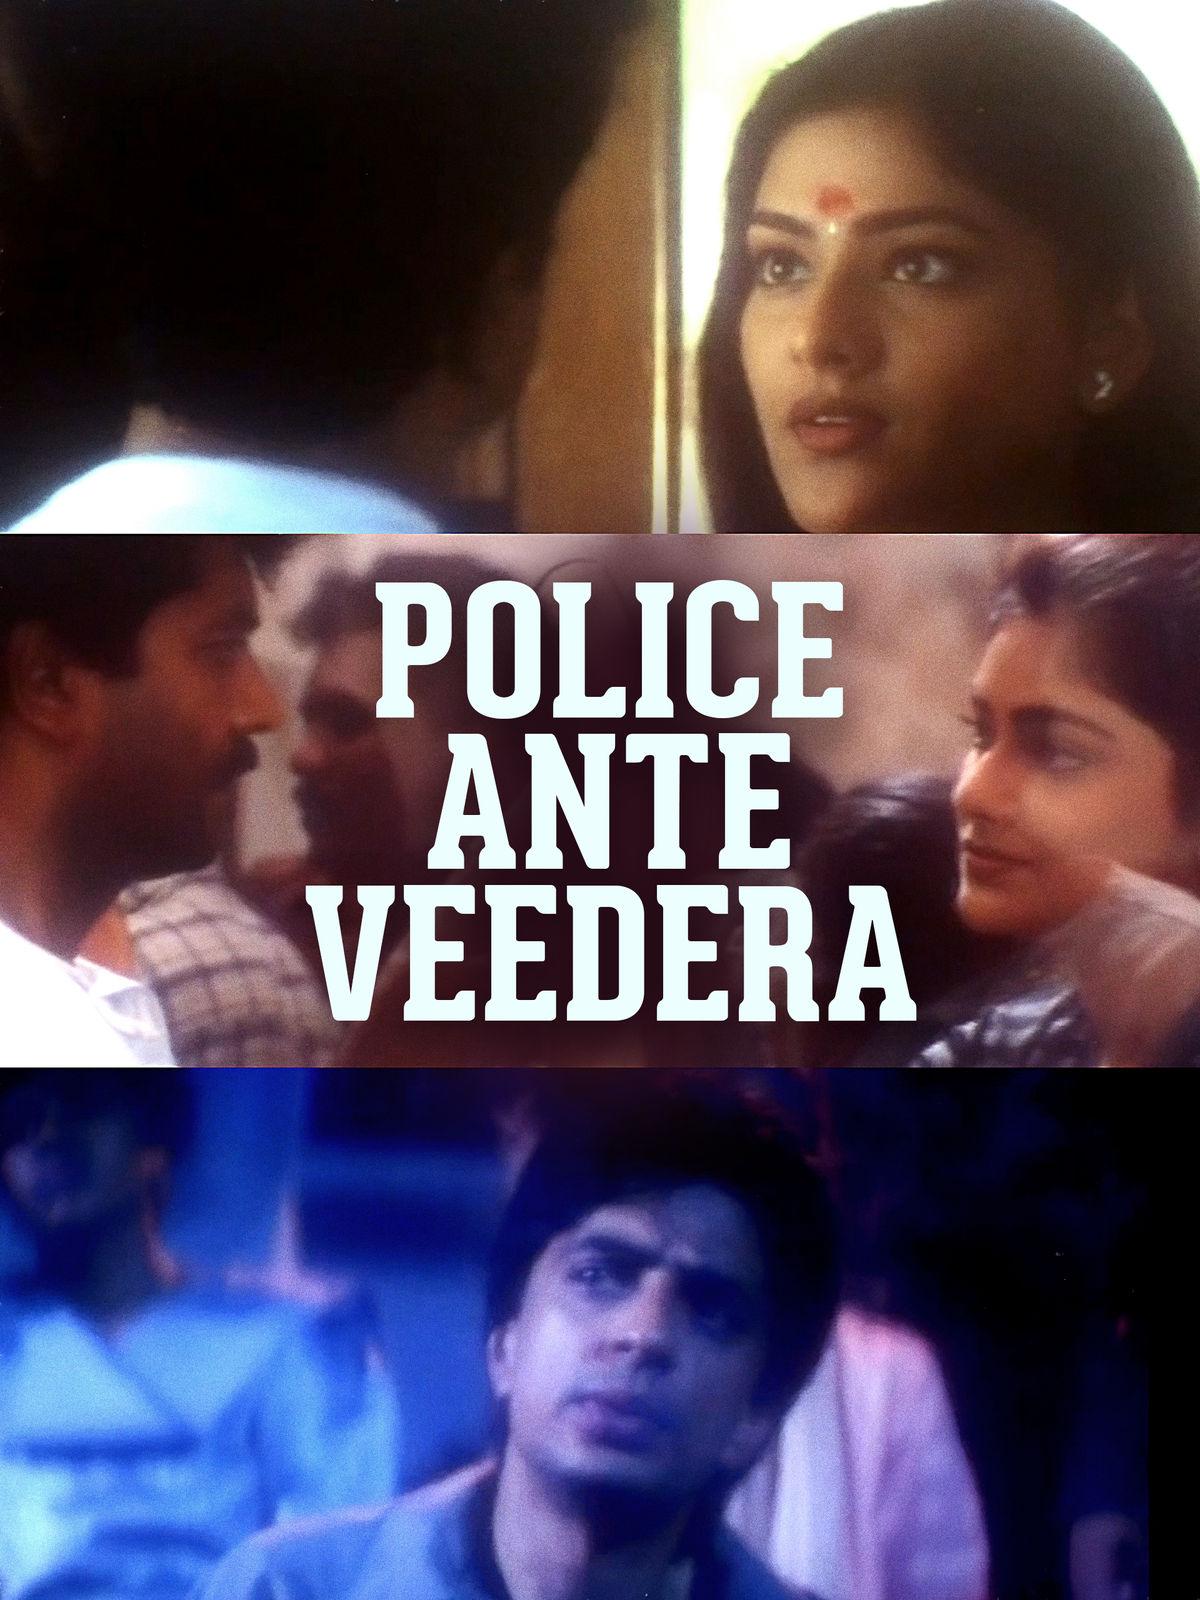 Police Ante Veedera